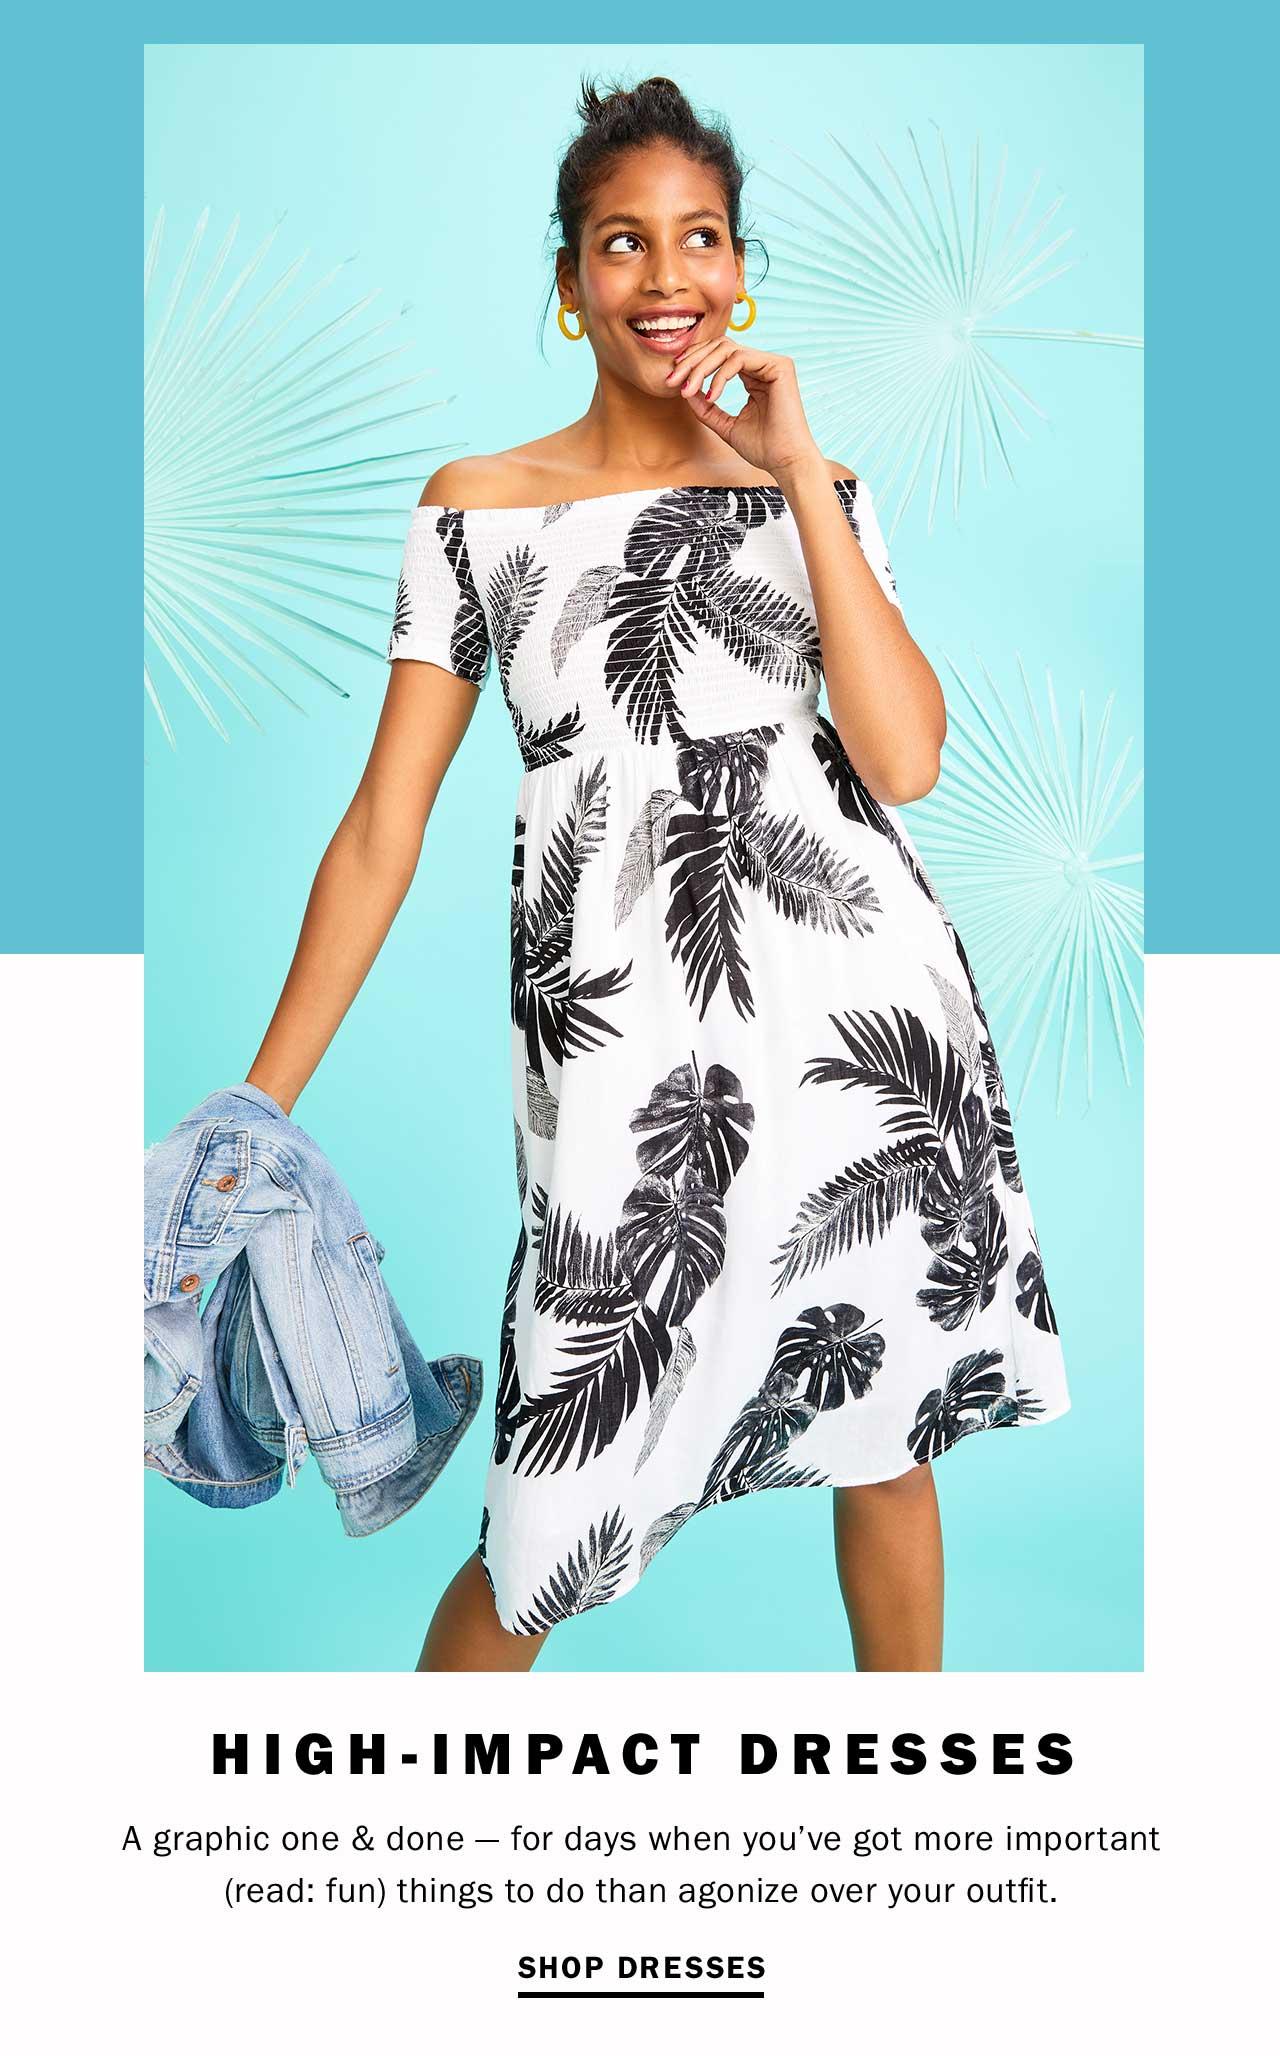 HIGH-IMPACT DRESSES | SHOP DRESSES